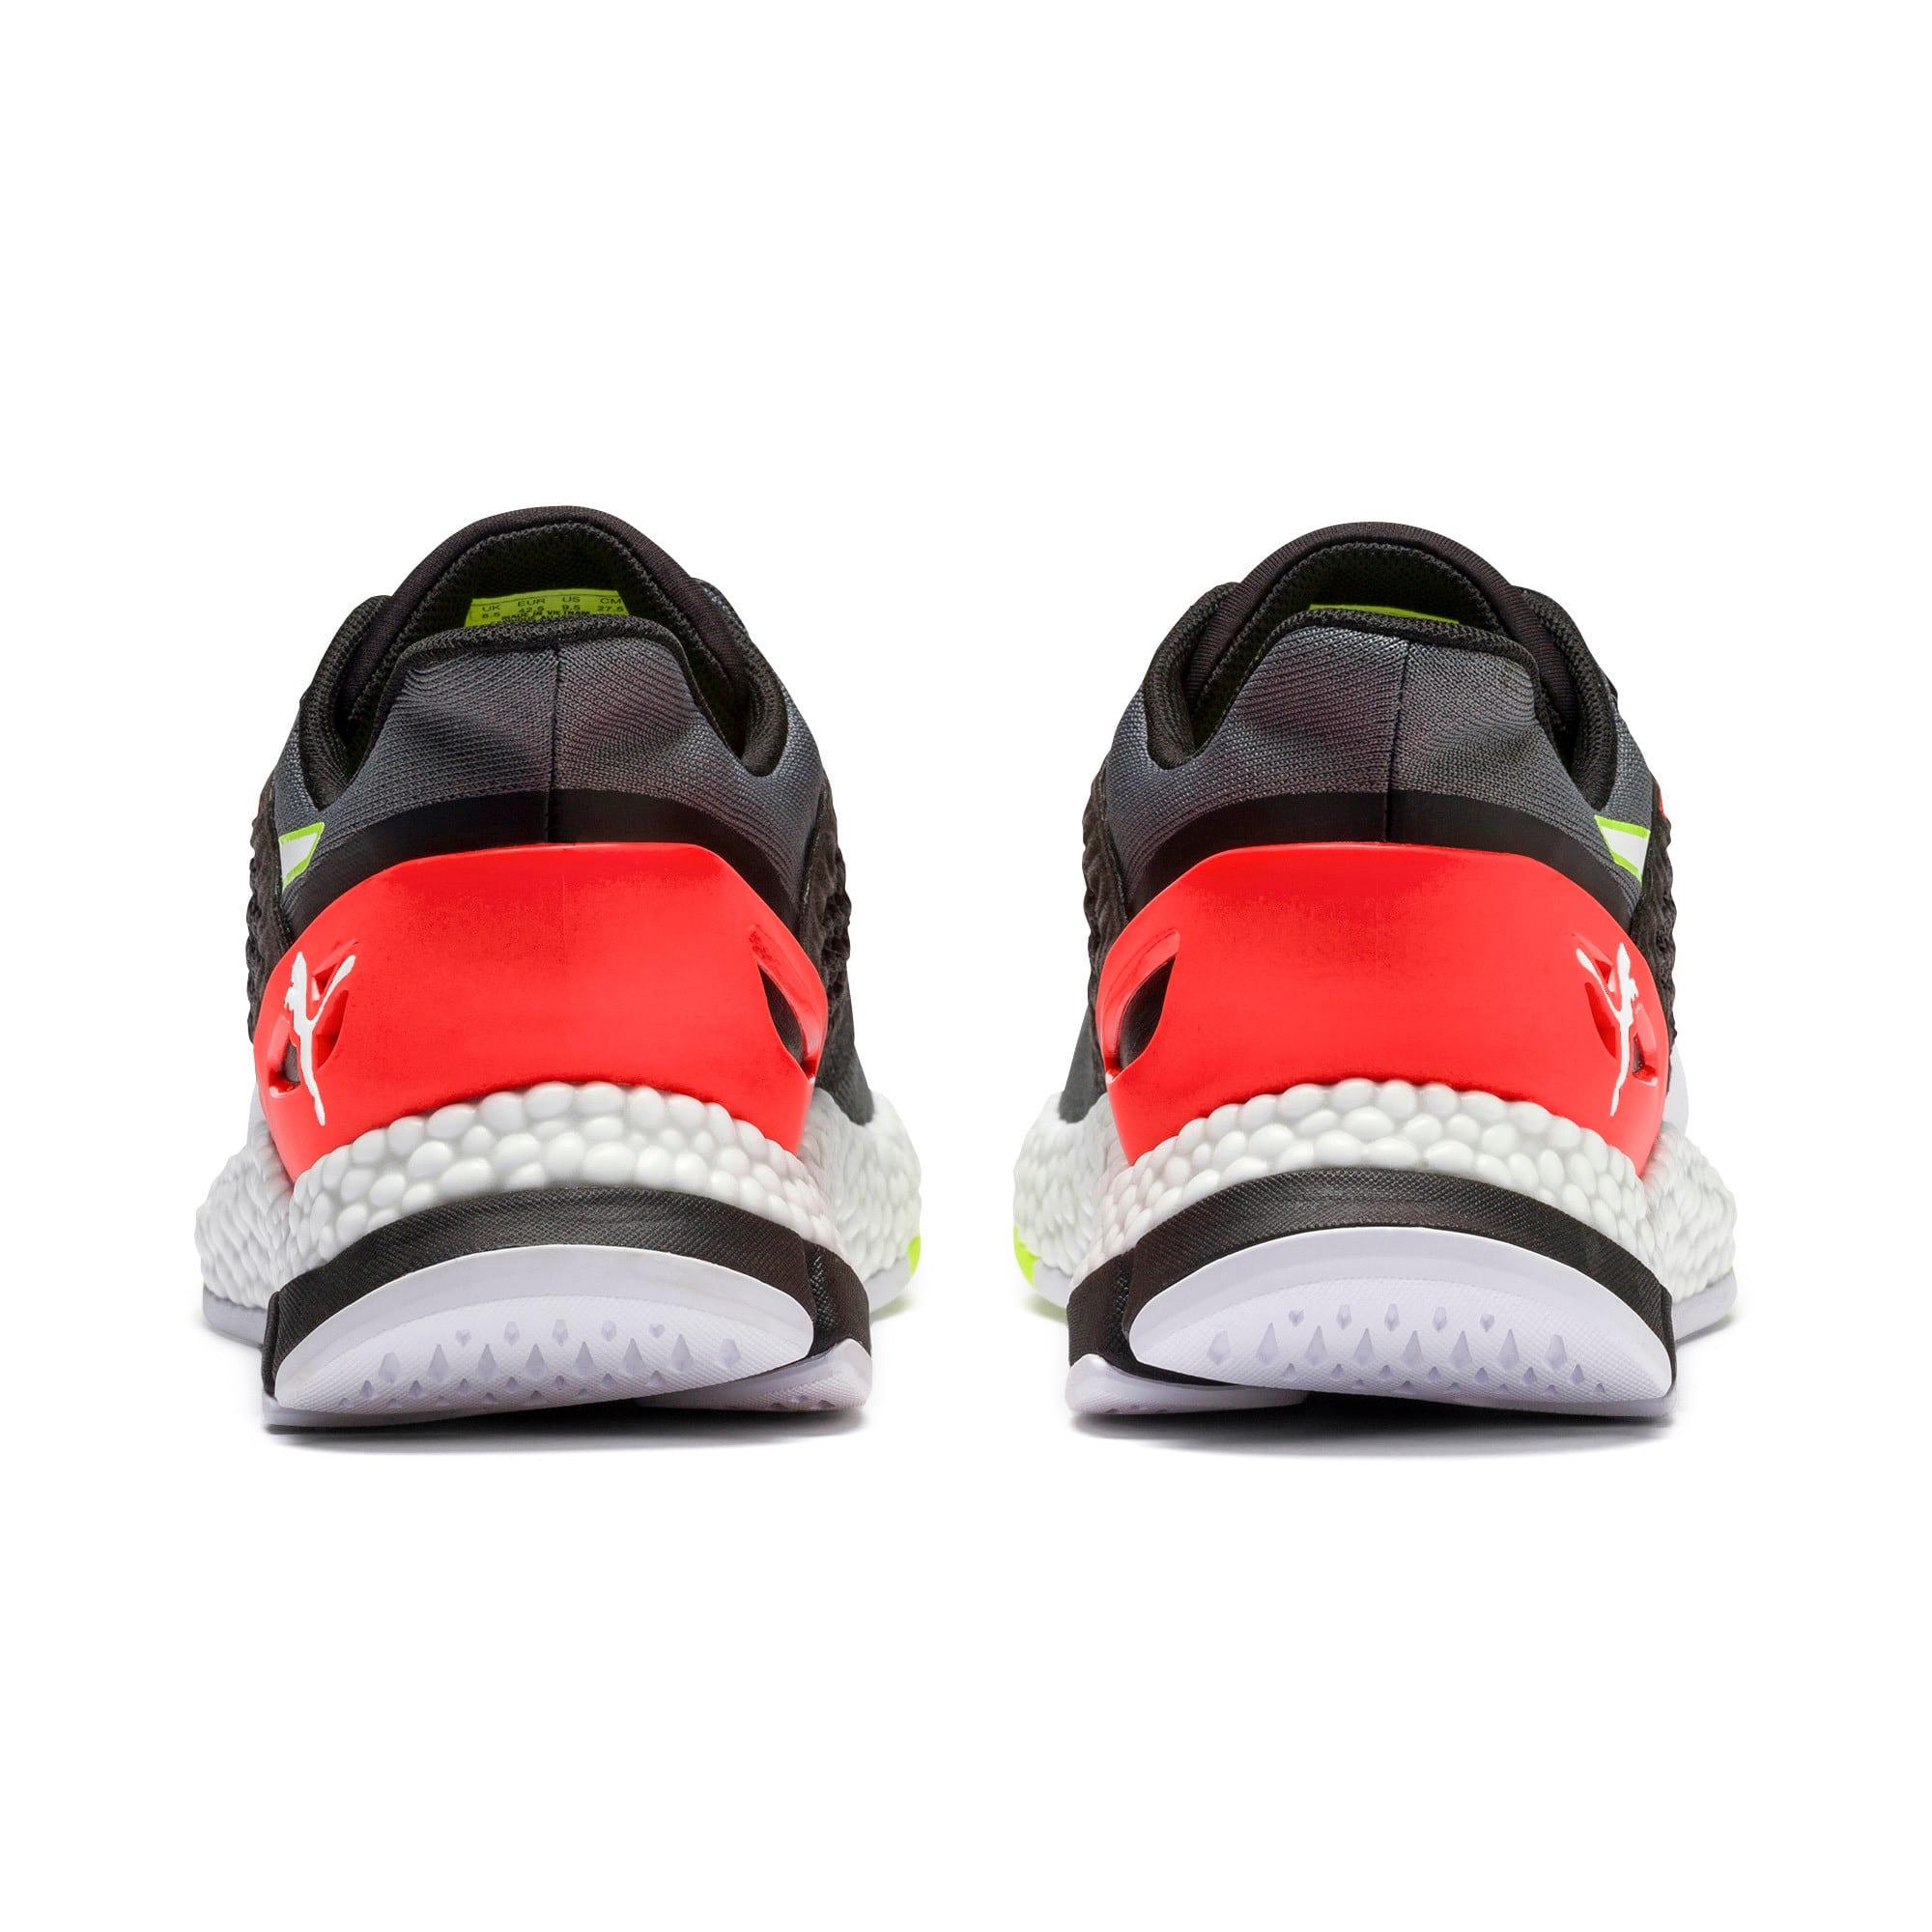 Thumbnail 4 of HYBRID Astro Men's Running Shoes, CASTLEROCK-Puma Blck-Ngy Red, medium